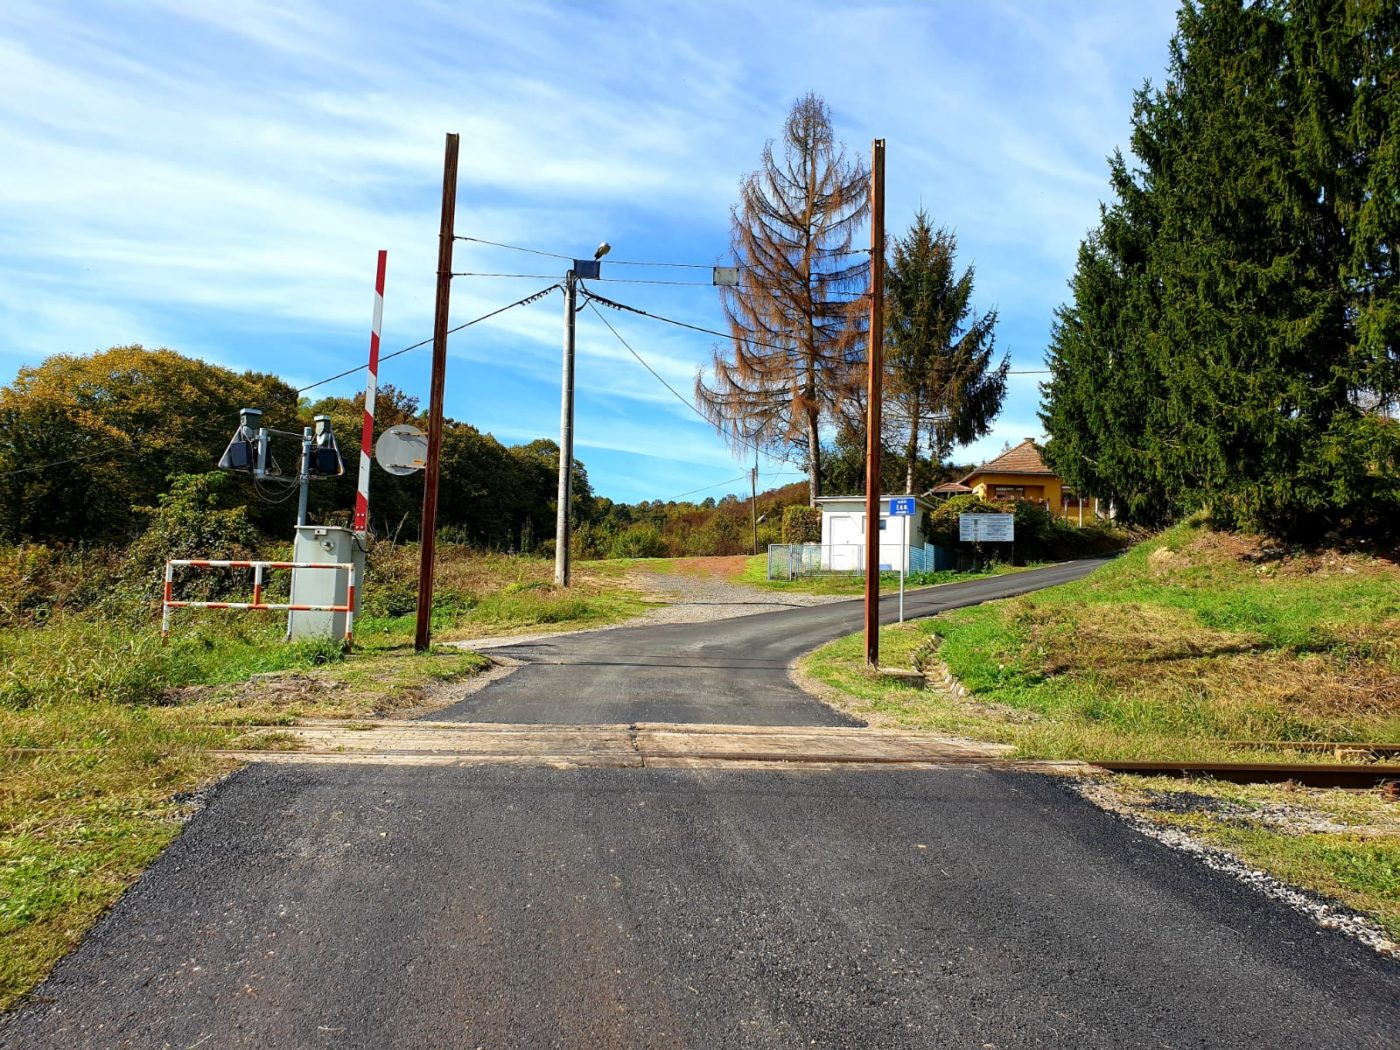 Održavanje lokalnih cesta